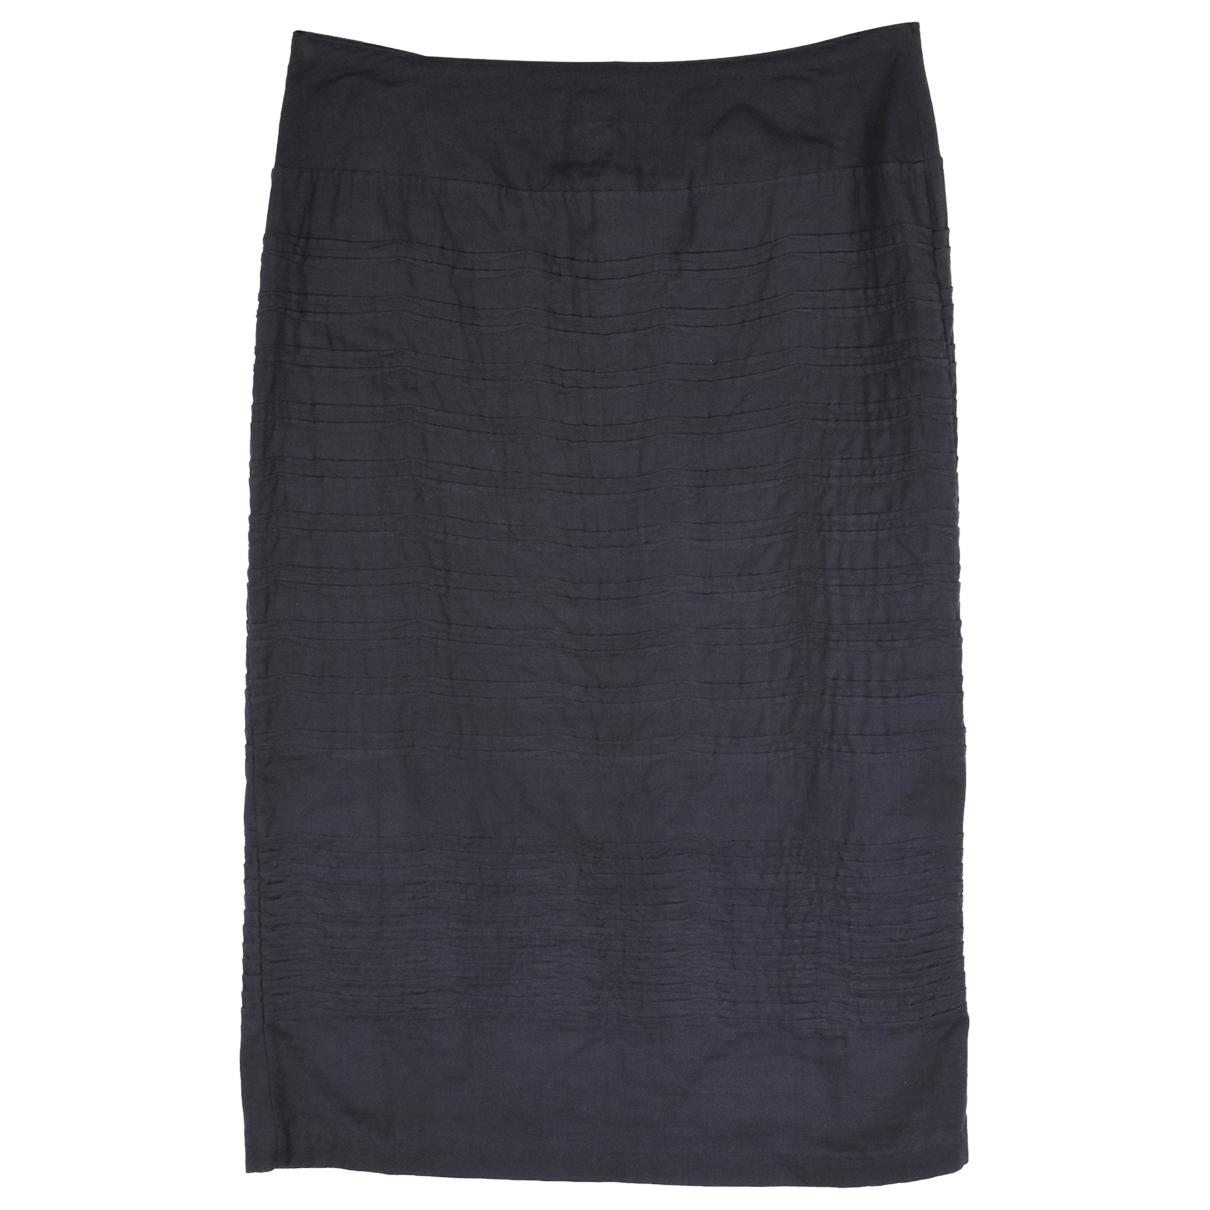 Issey Miyake - Jupe   pour femme en coton - noir